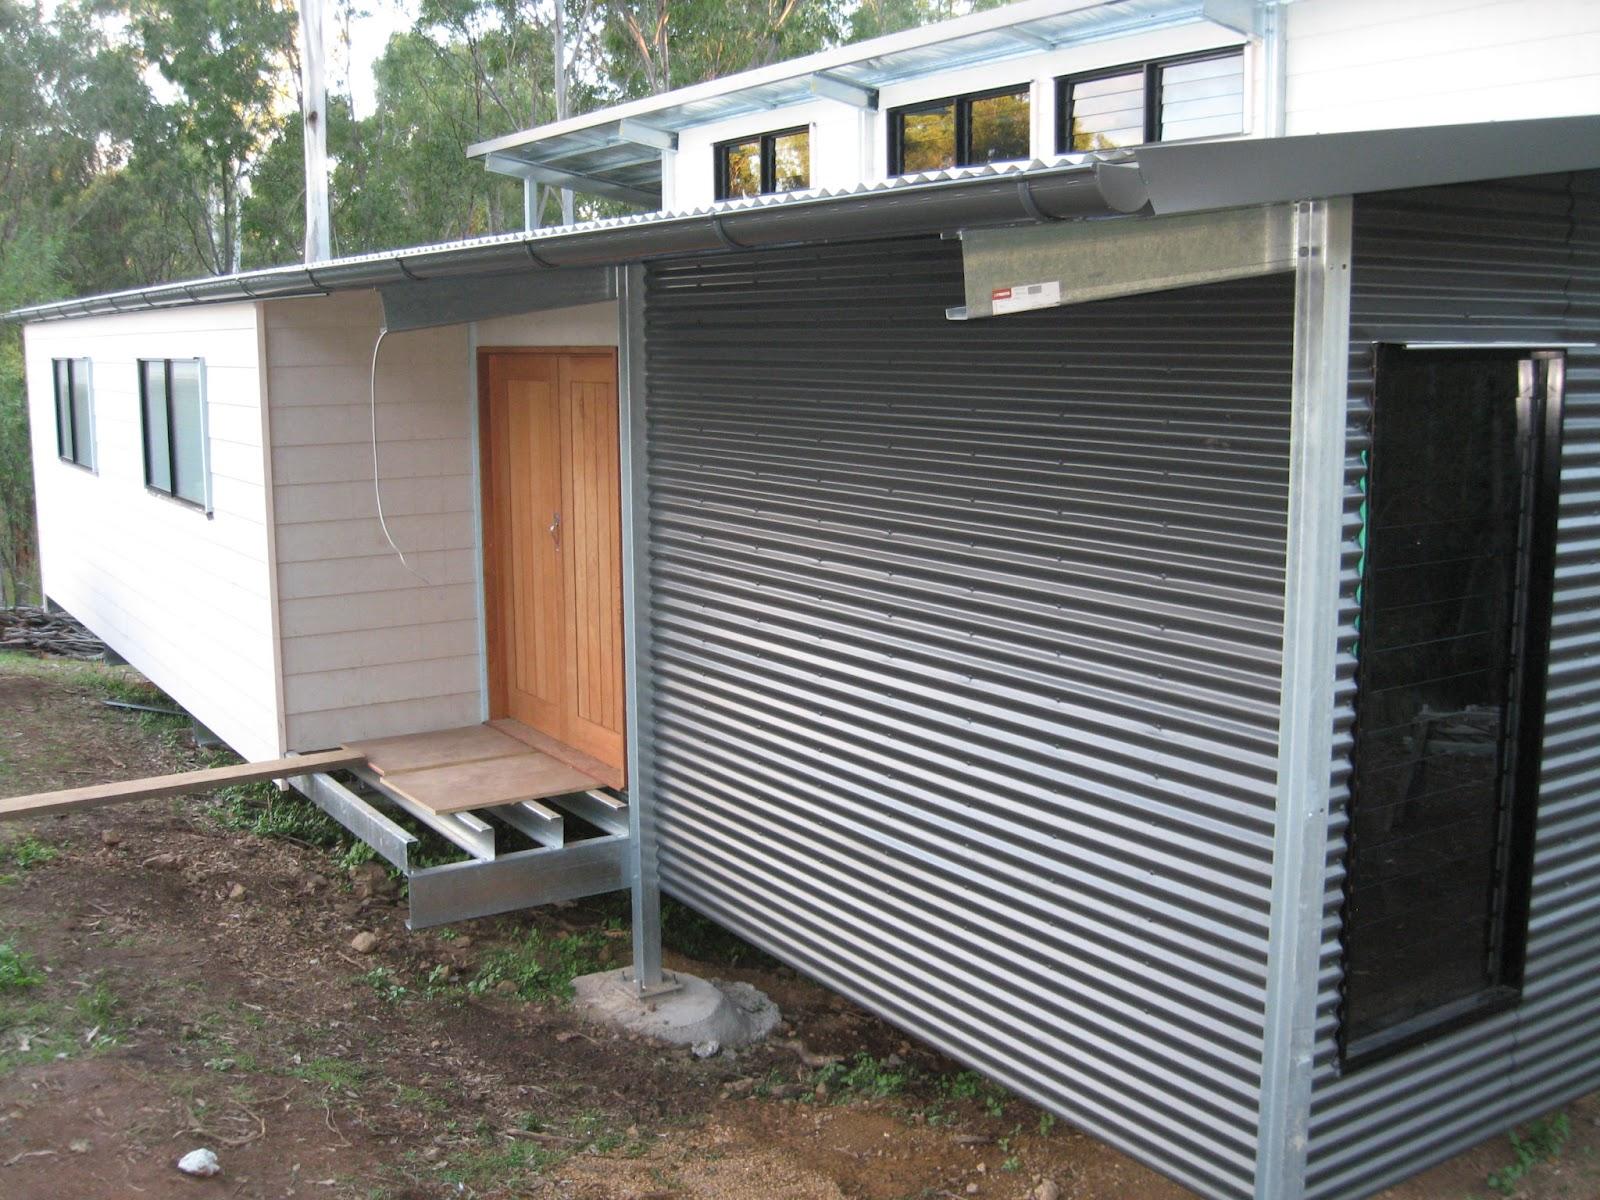 Ezy Homes Australia: July 2012